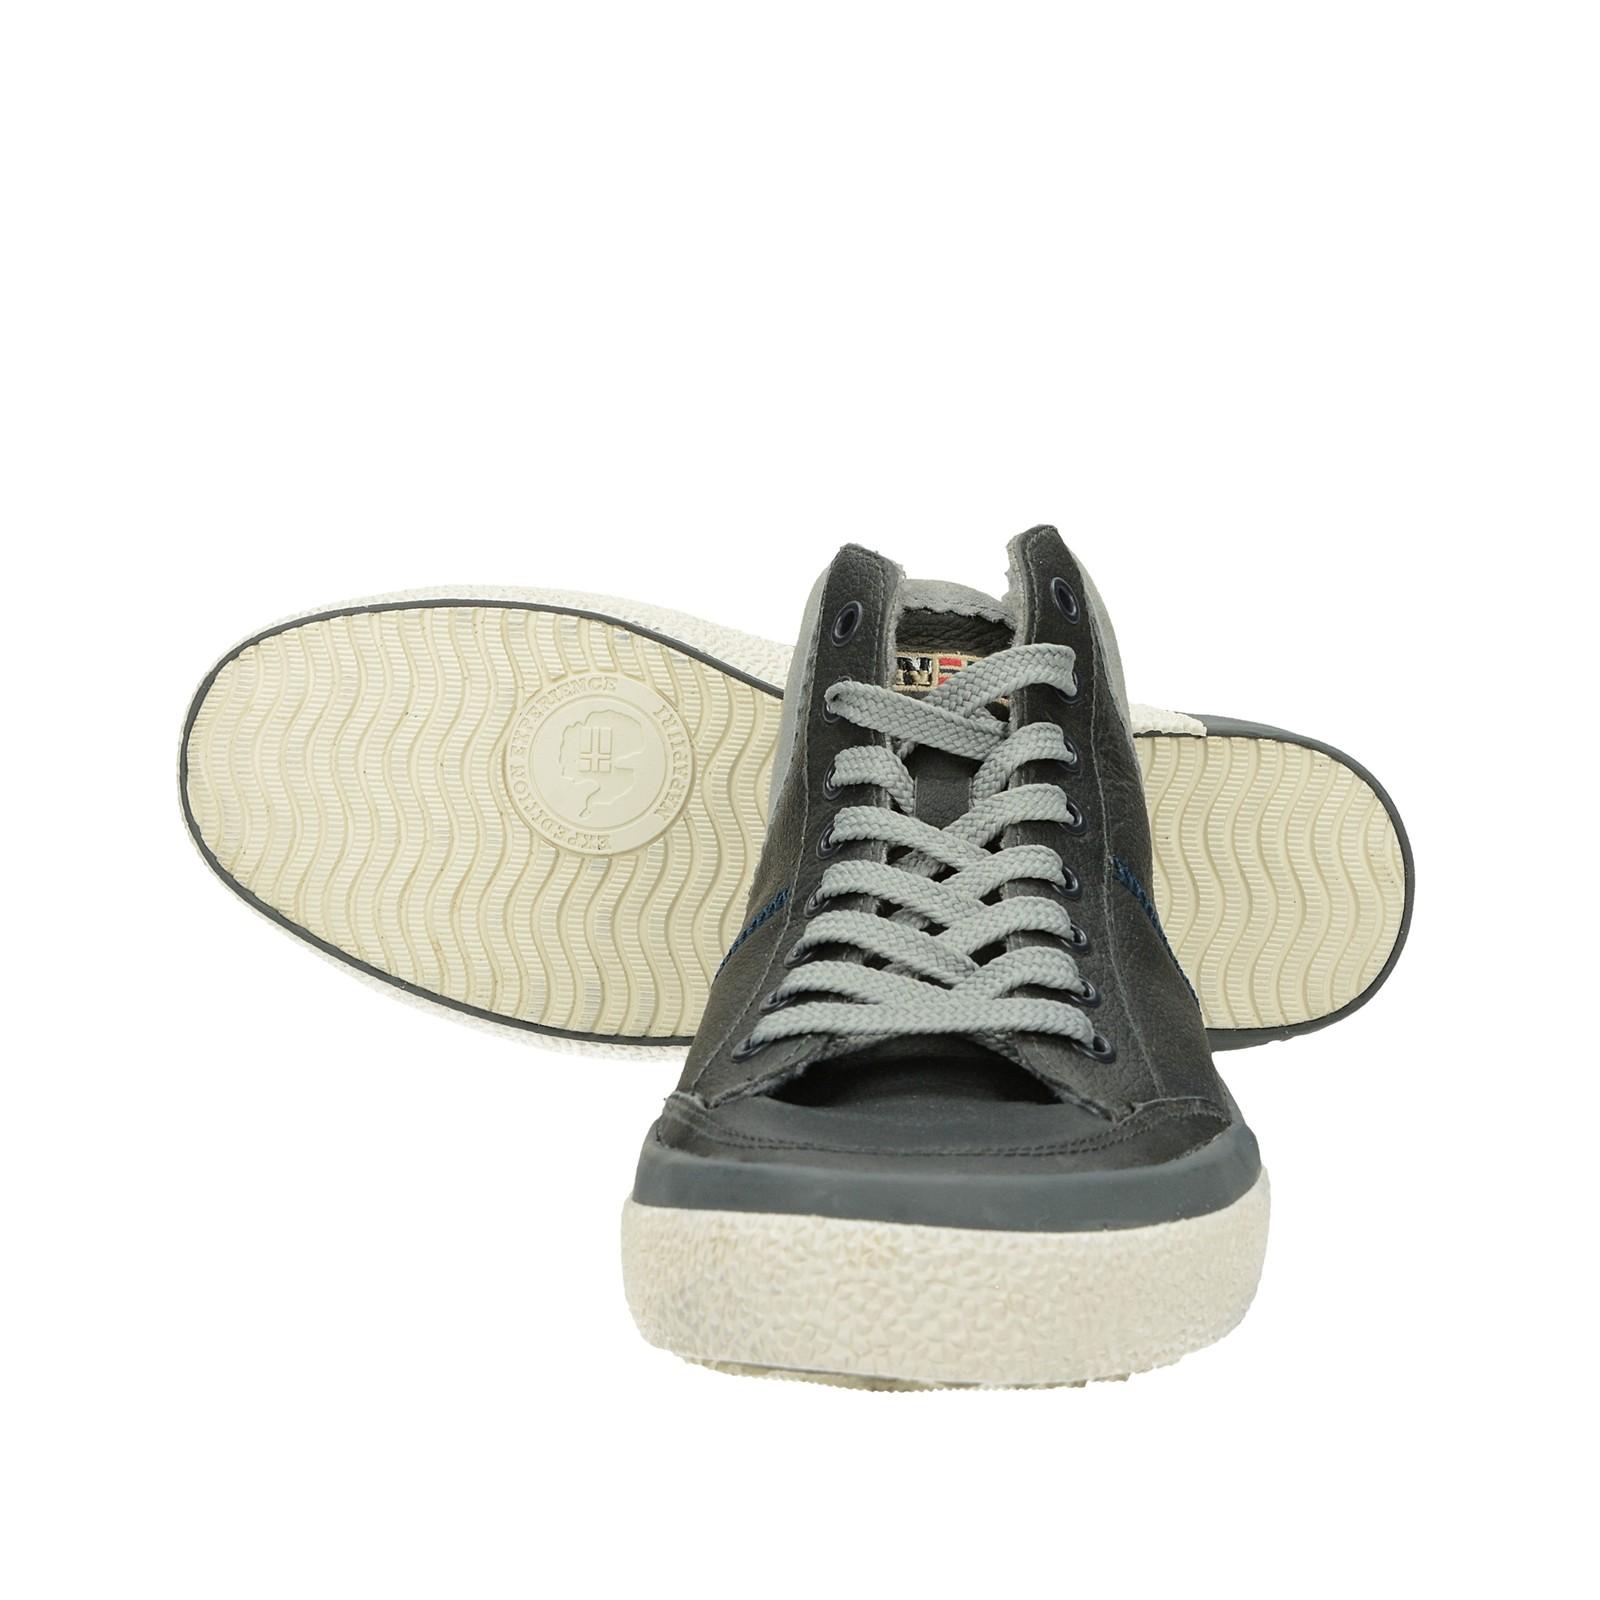 Napapijri pánské kožené zateplené tenisky - šedé